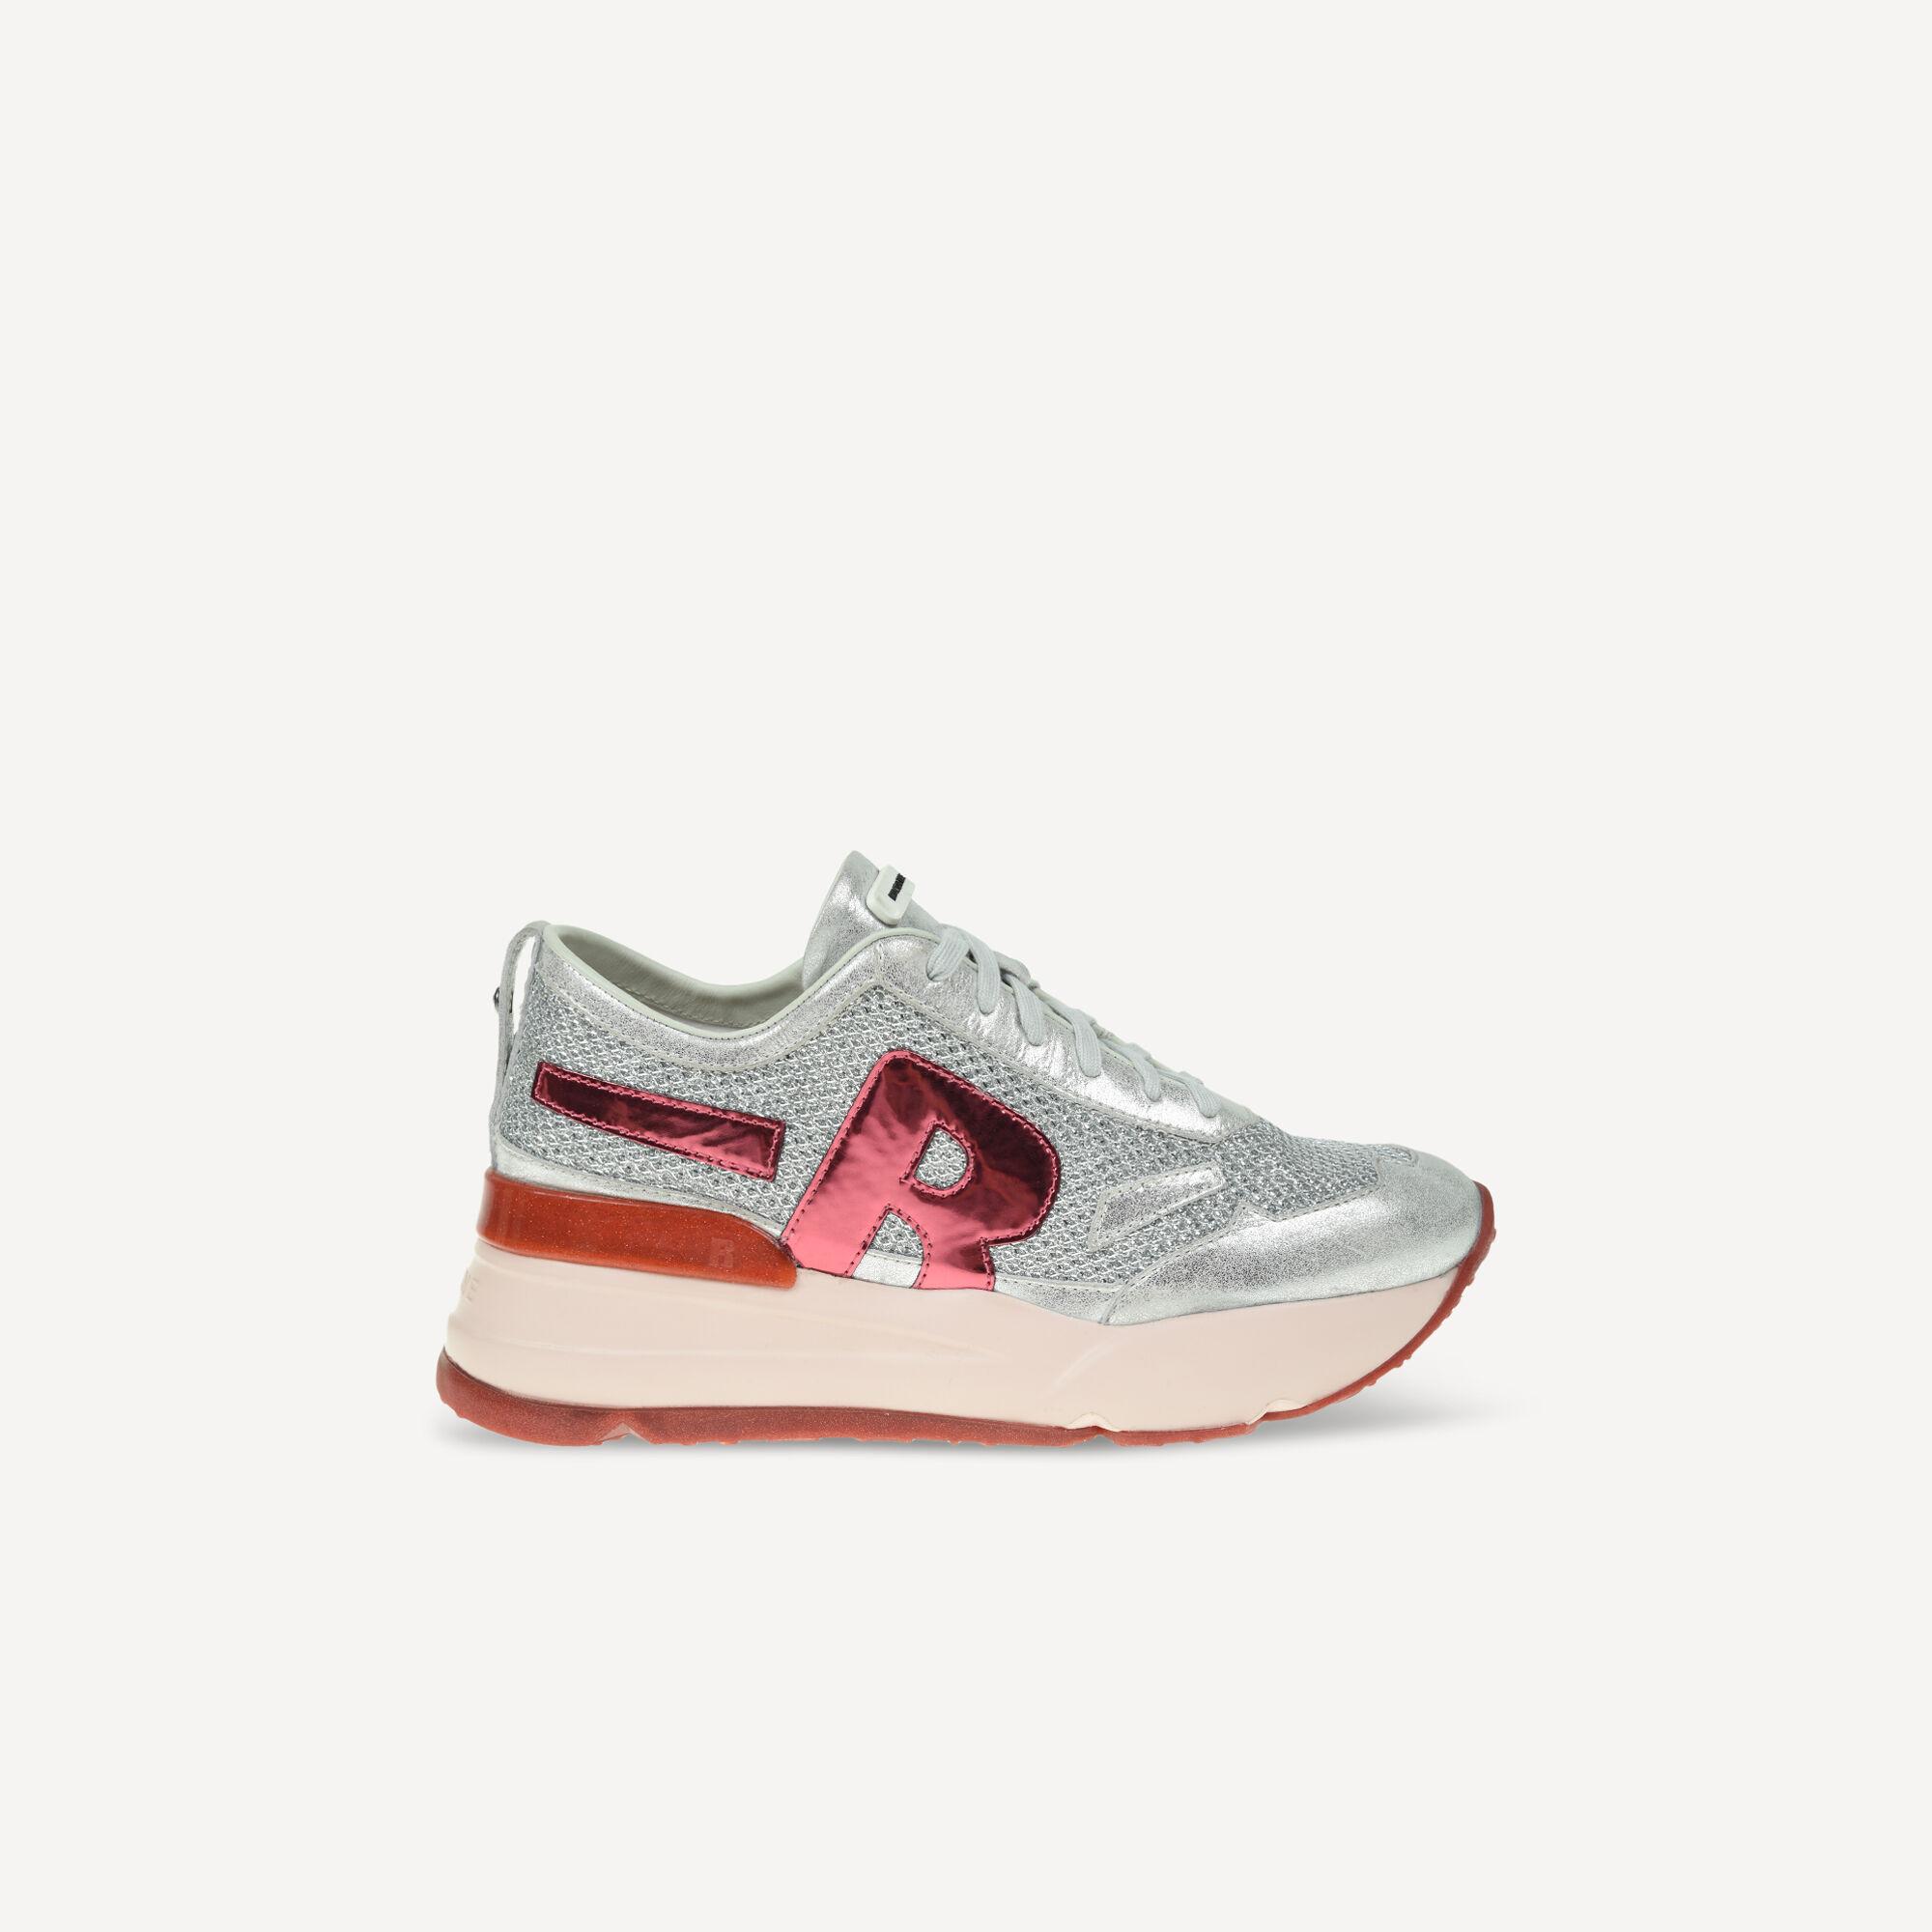 sale big sale Rucoline R-Evolve 4009 sneakers fashion Style sale explore outlet new PGni7E